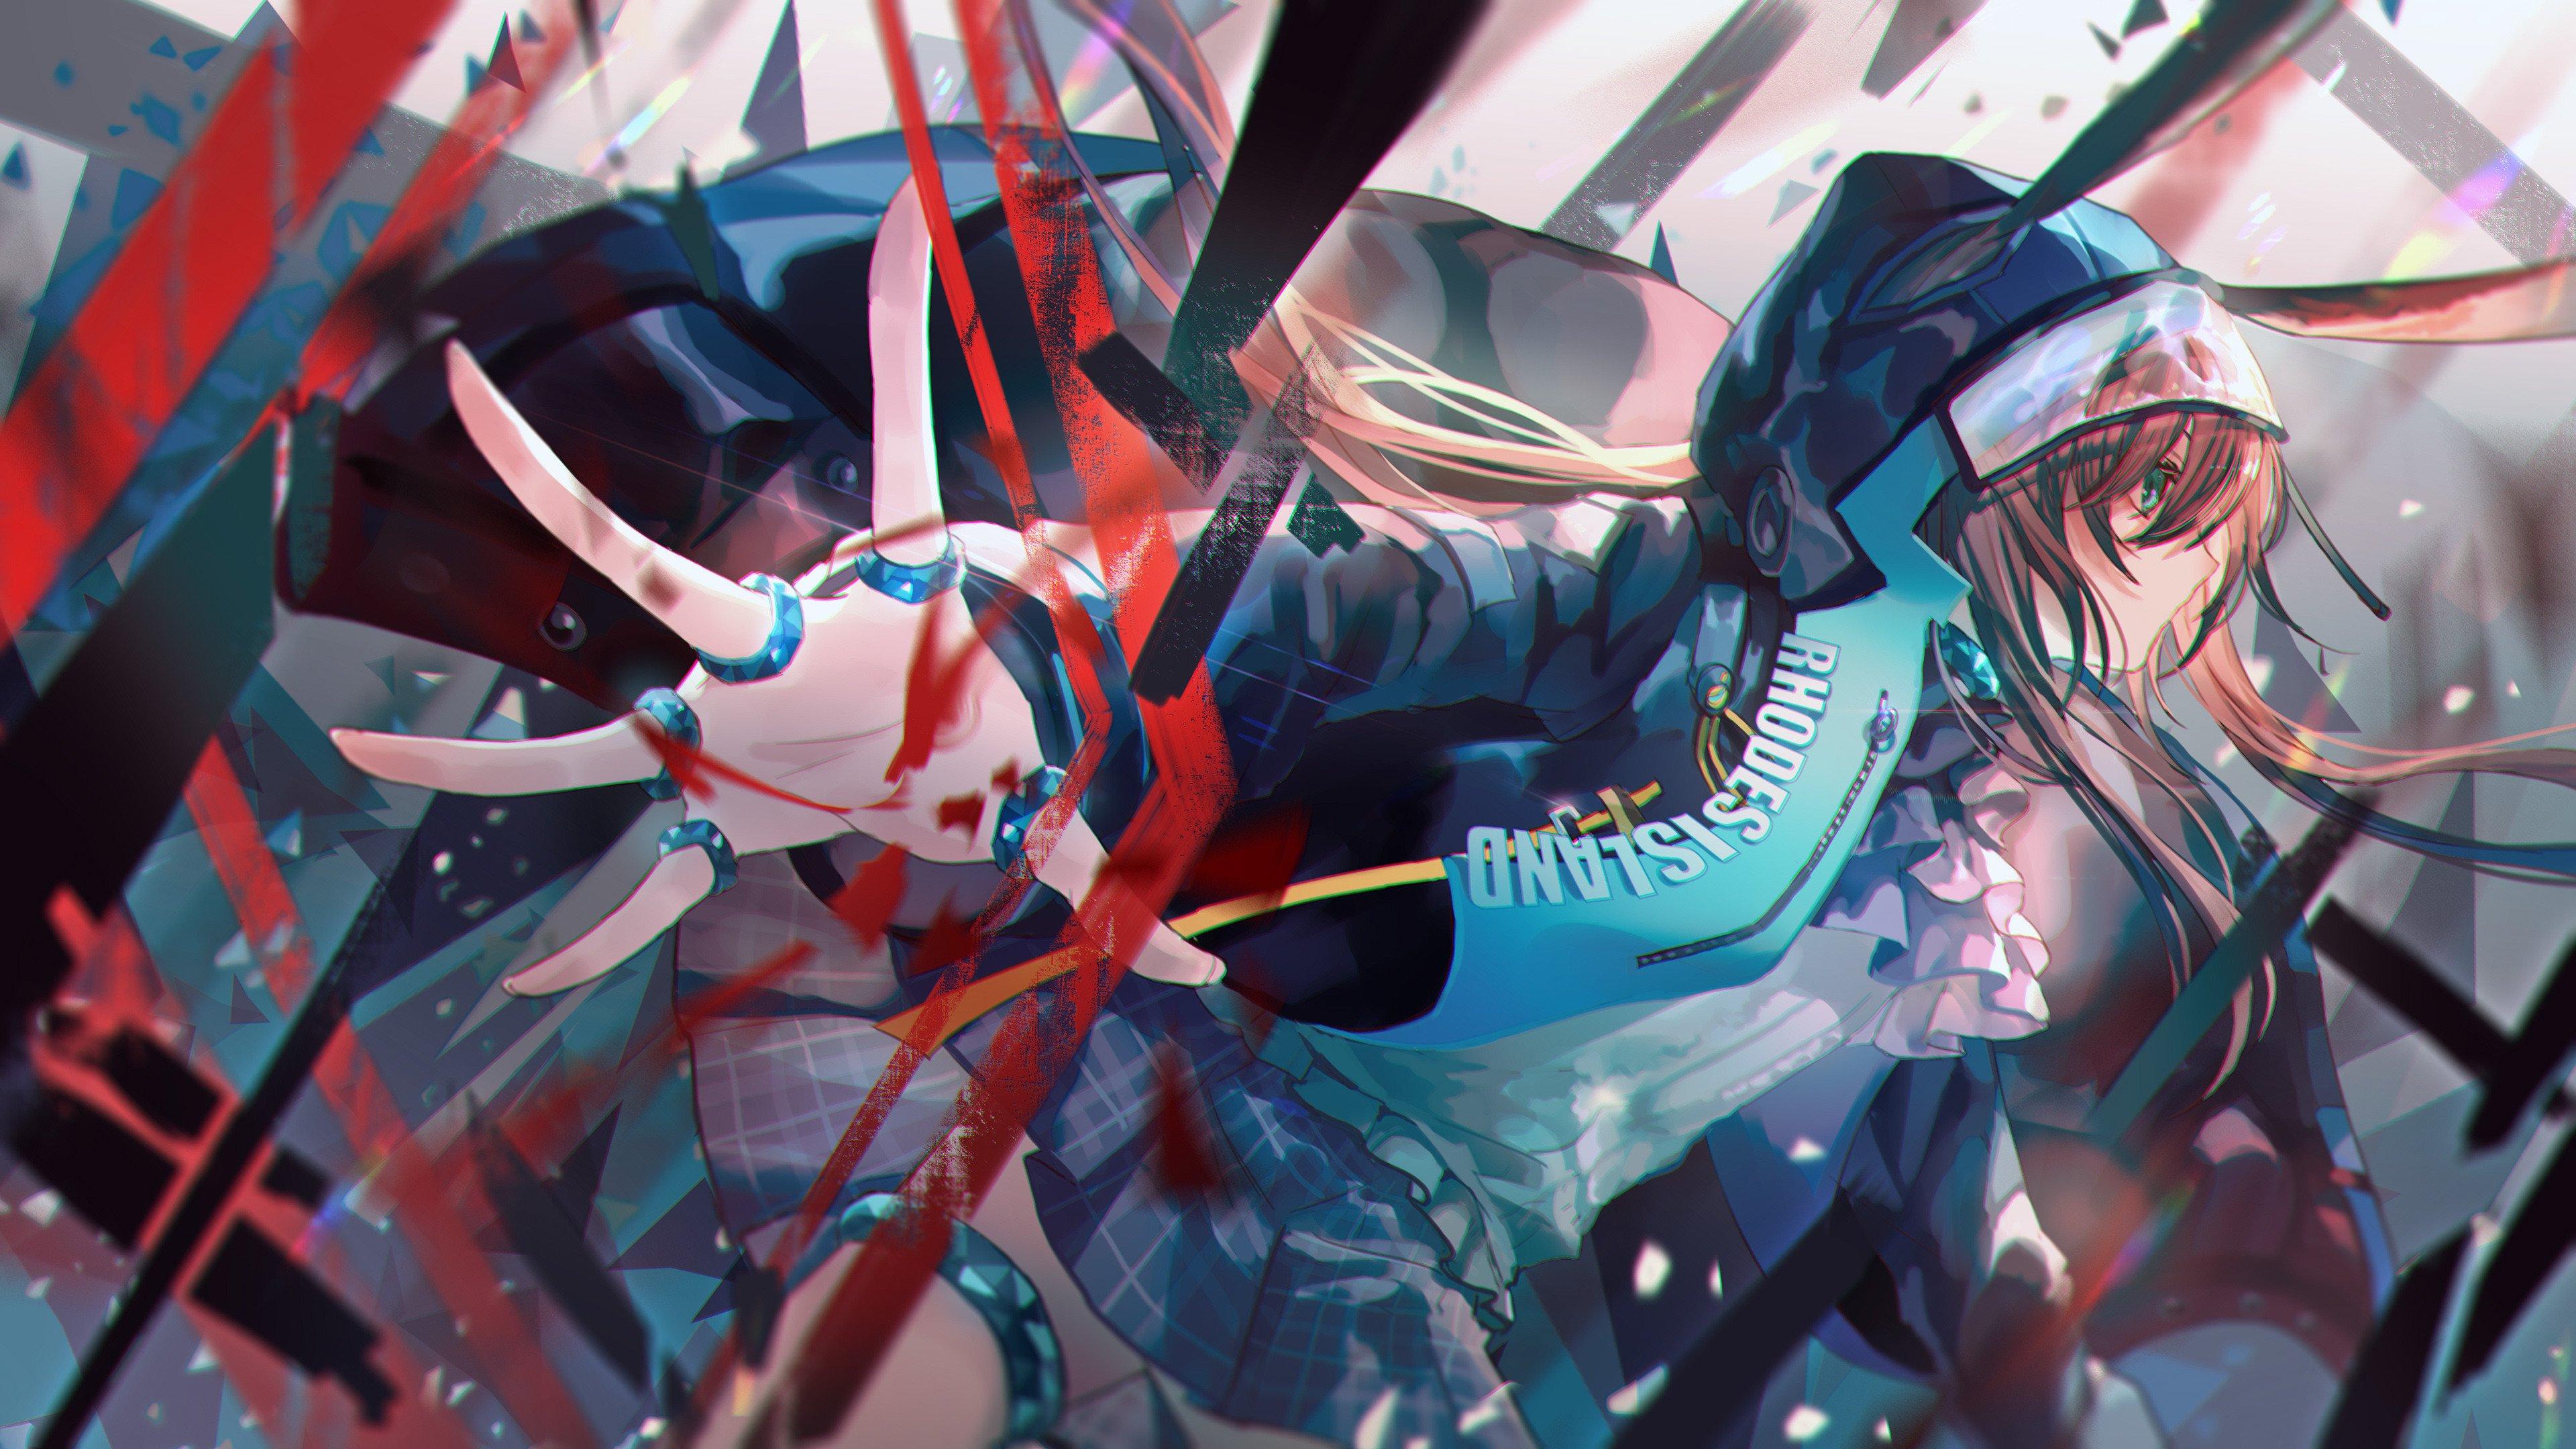 Fondos de pantalla Anime Amiya de Arknights